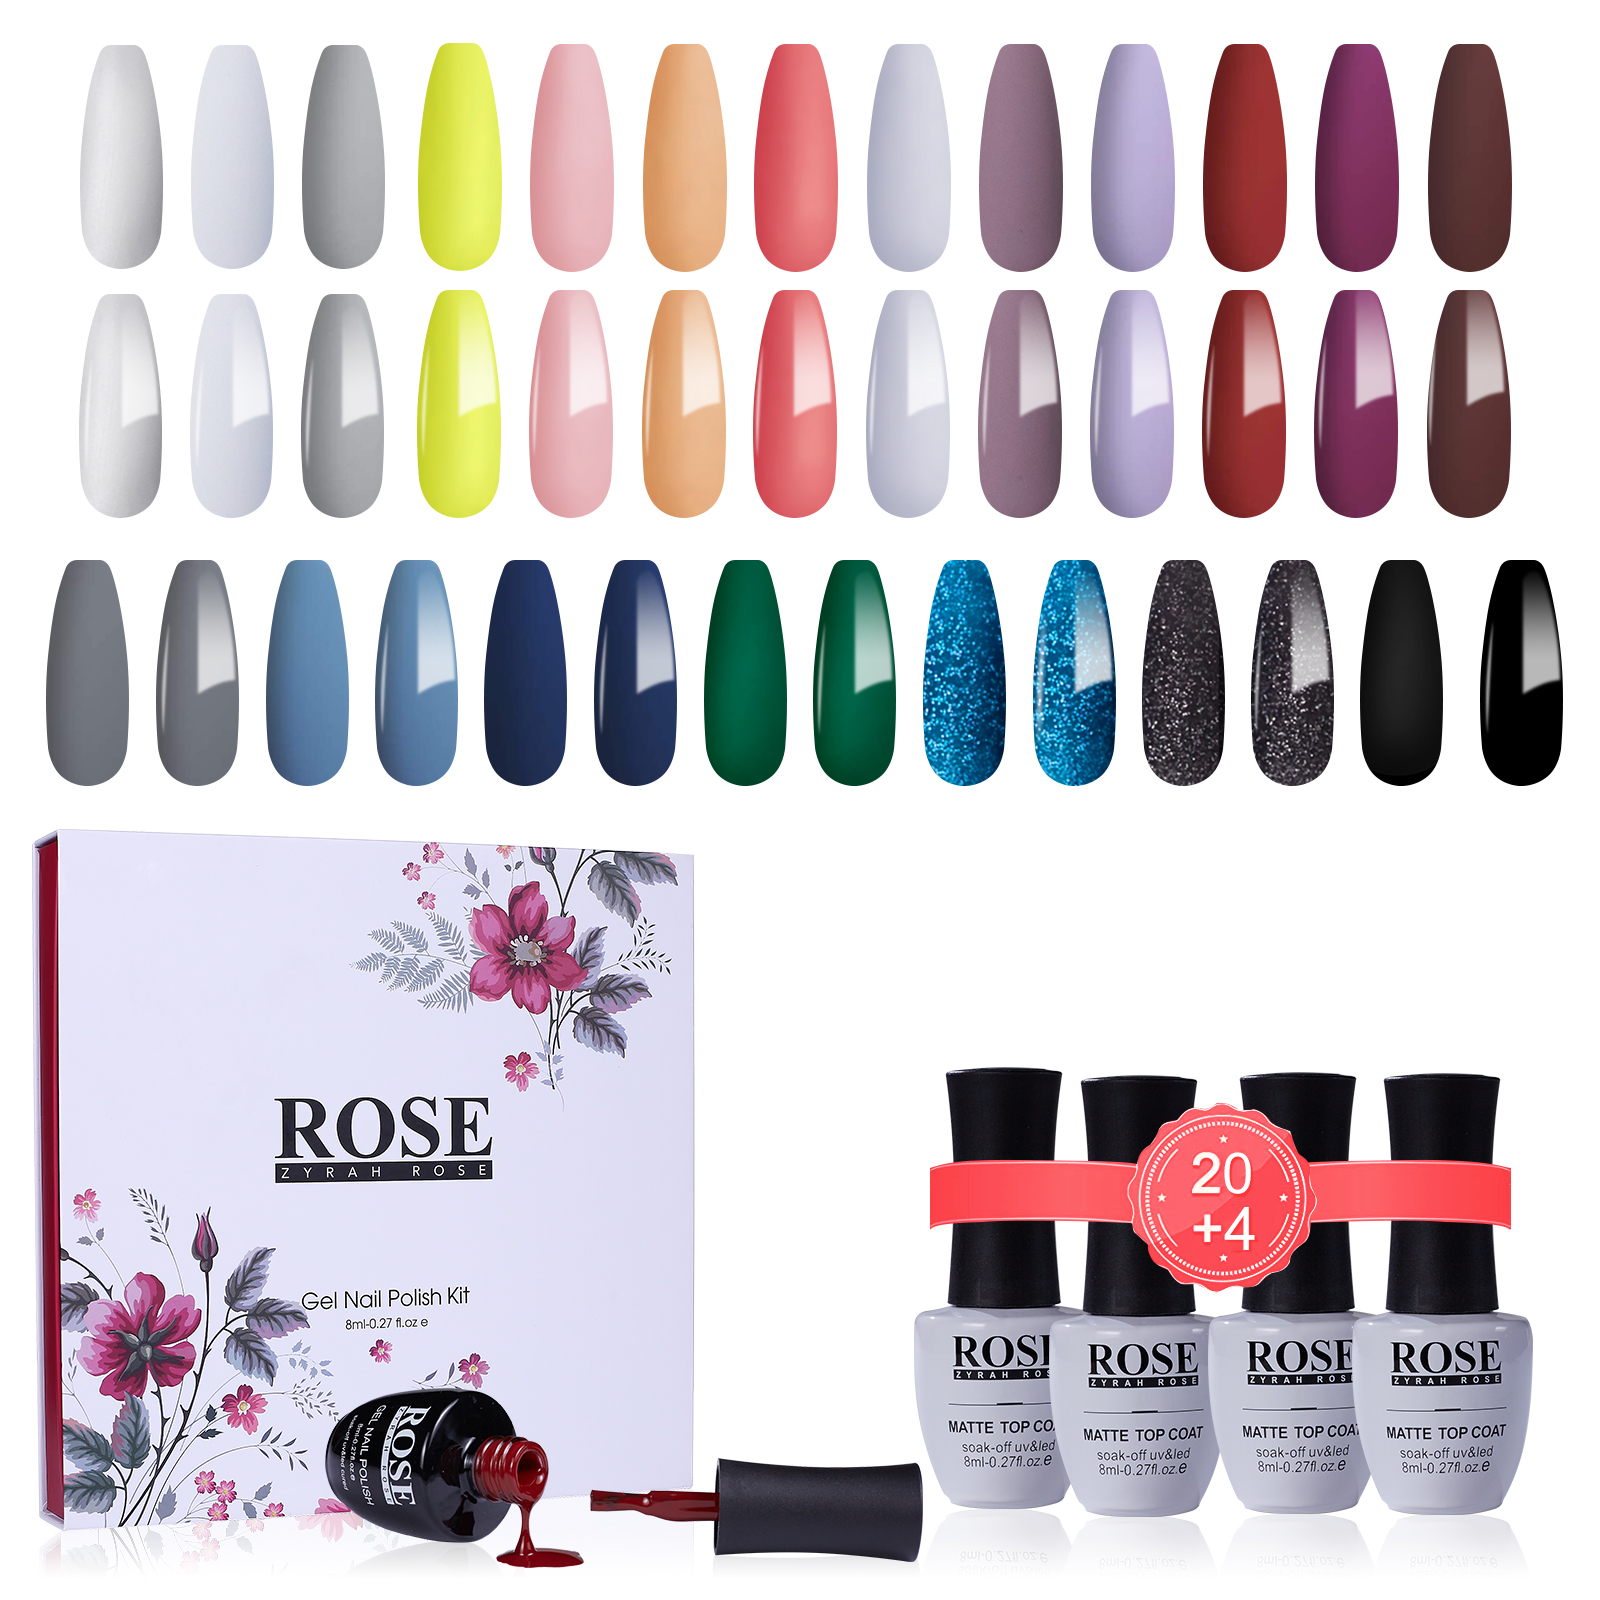 Wholesale China Nail Gel Supplier Private Label Colors Soak Off Led poly Nails Polish Colour Uv Gel Nail Polish kit professional